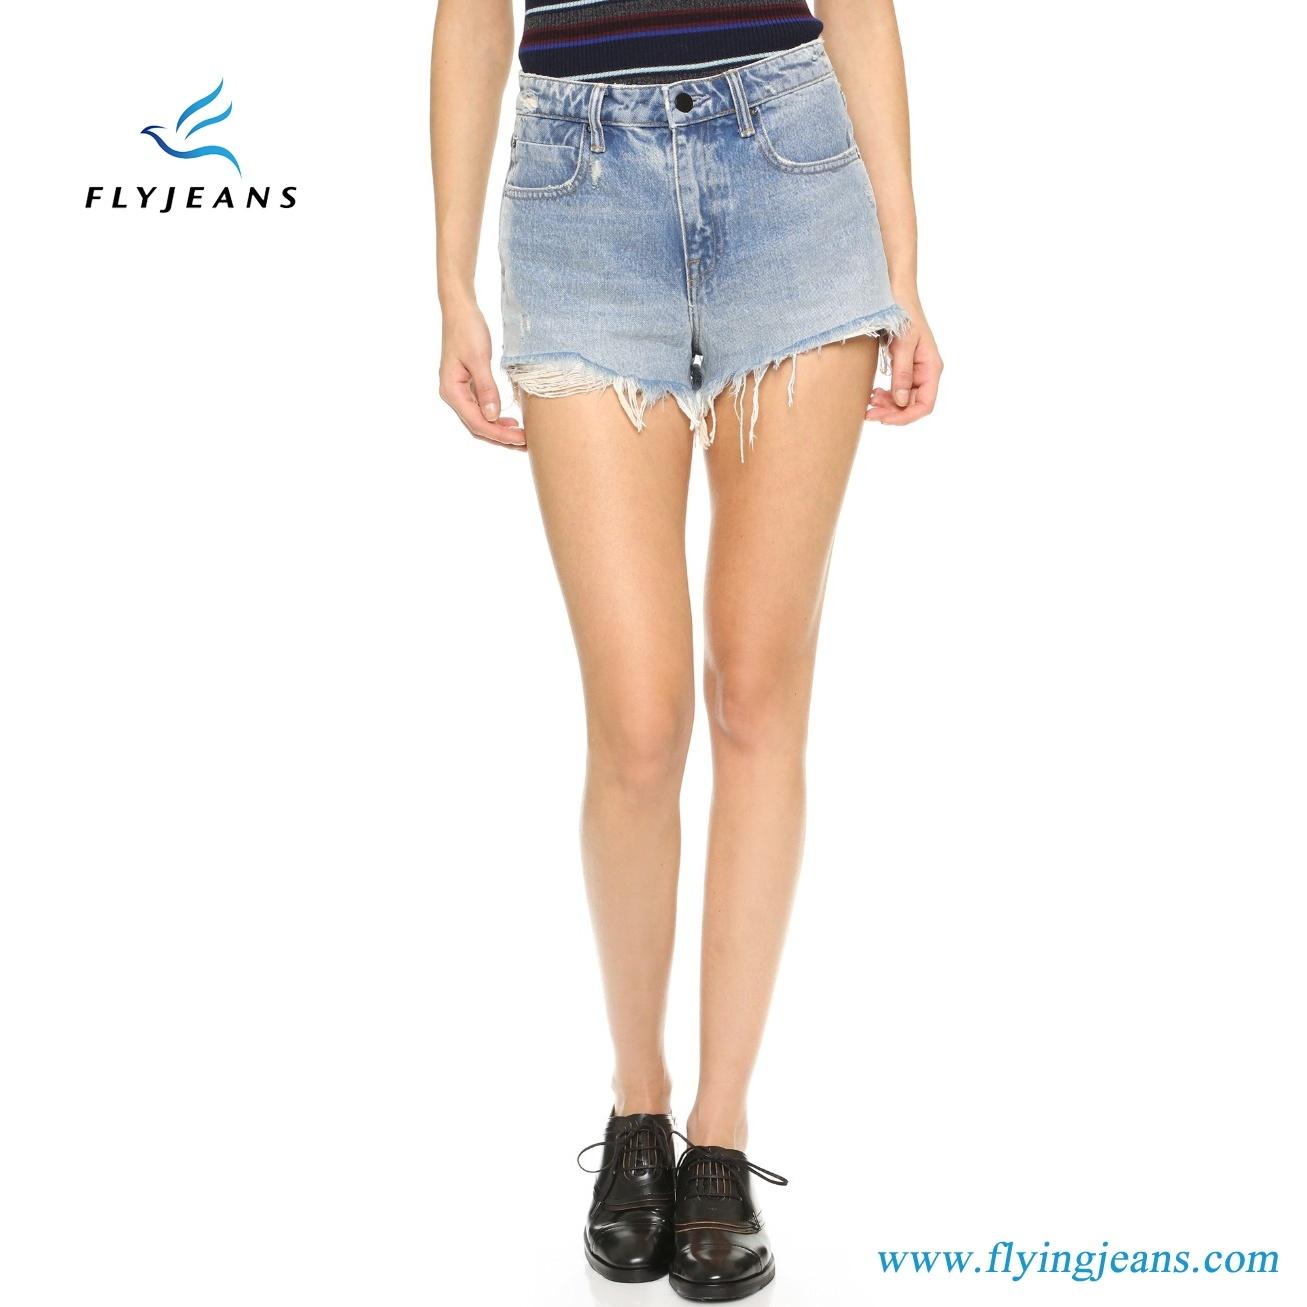 18f378951e China Hot Sale Fashion Blue Skinny Frayed Distressed Mini Pants Ladies/Women  Denim Shorts by Jeans Manufacturer (Shorts E. P. 222) - China Girls Shorts,  ...